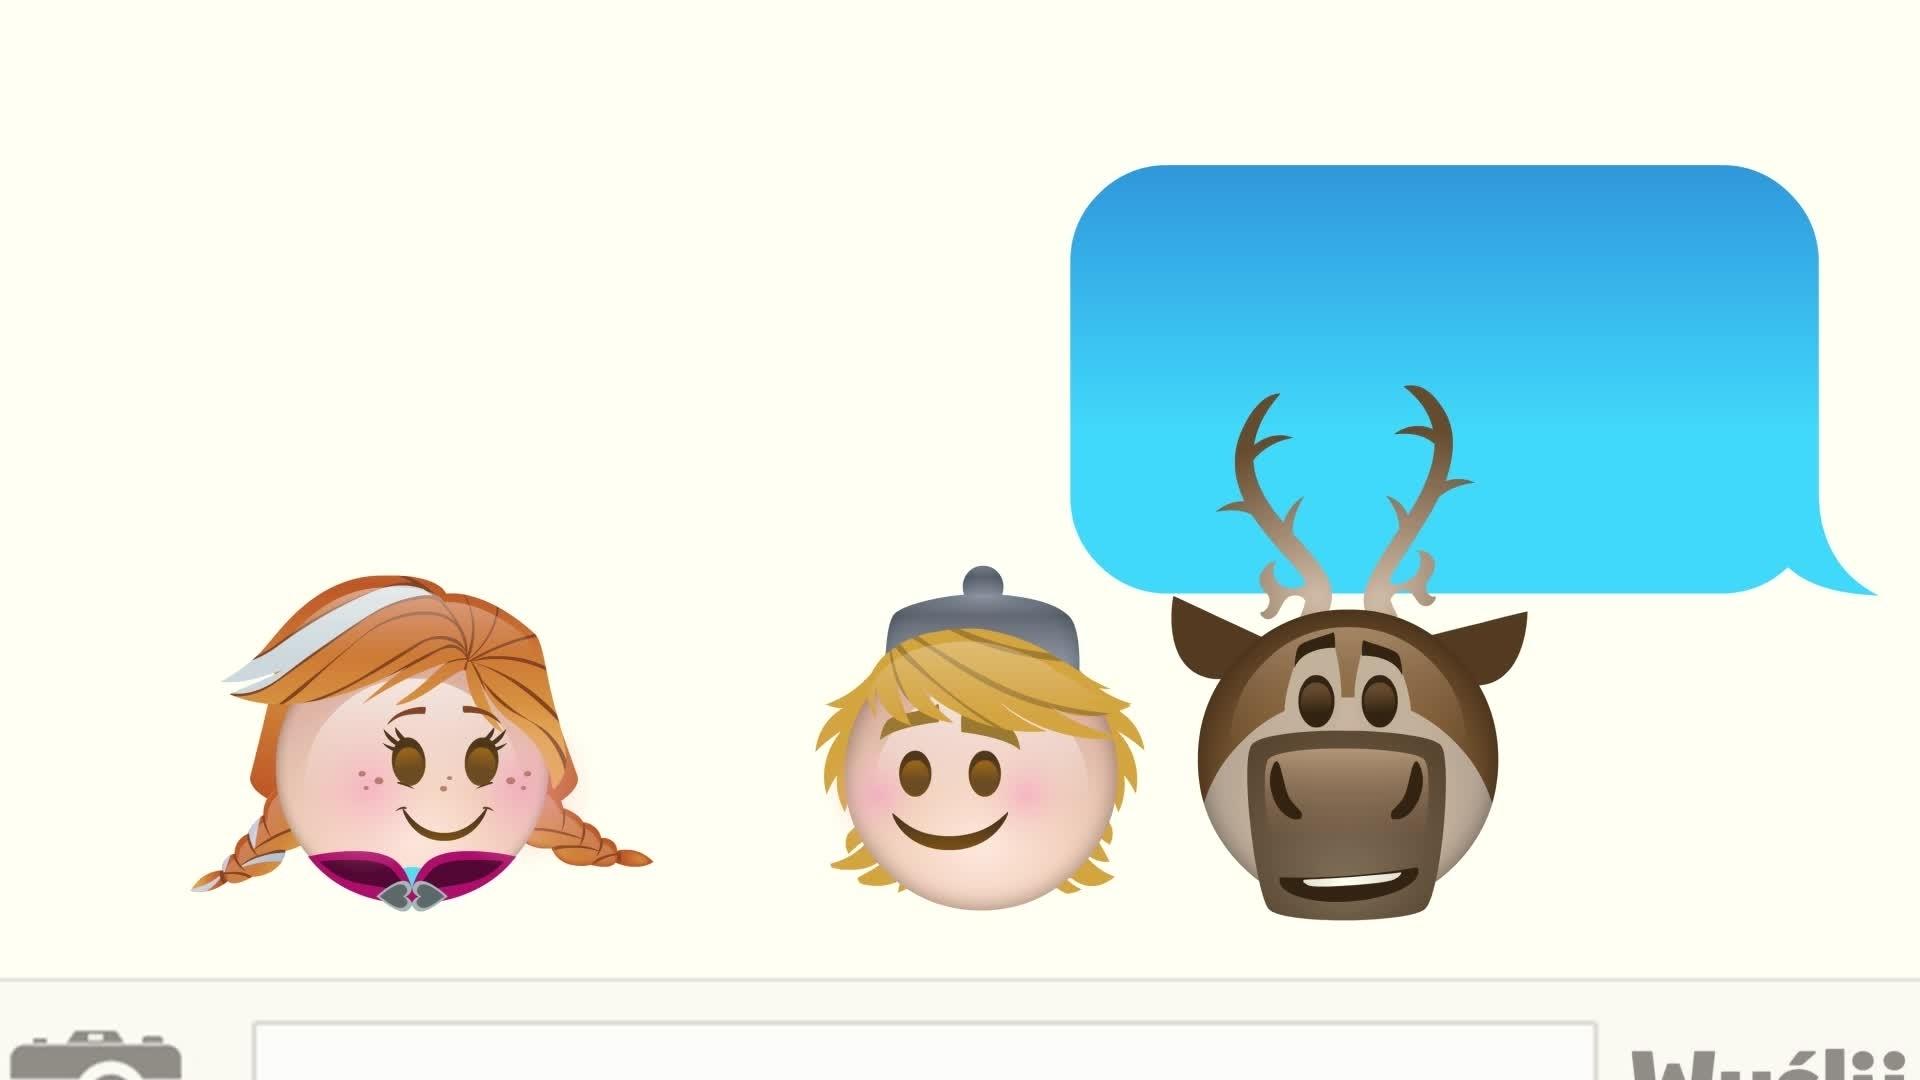 Kraina lodu w wersji emoji